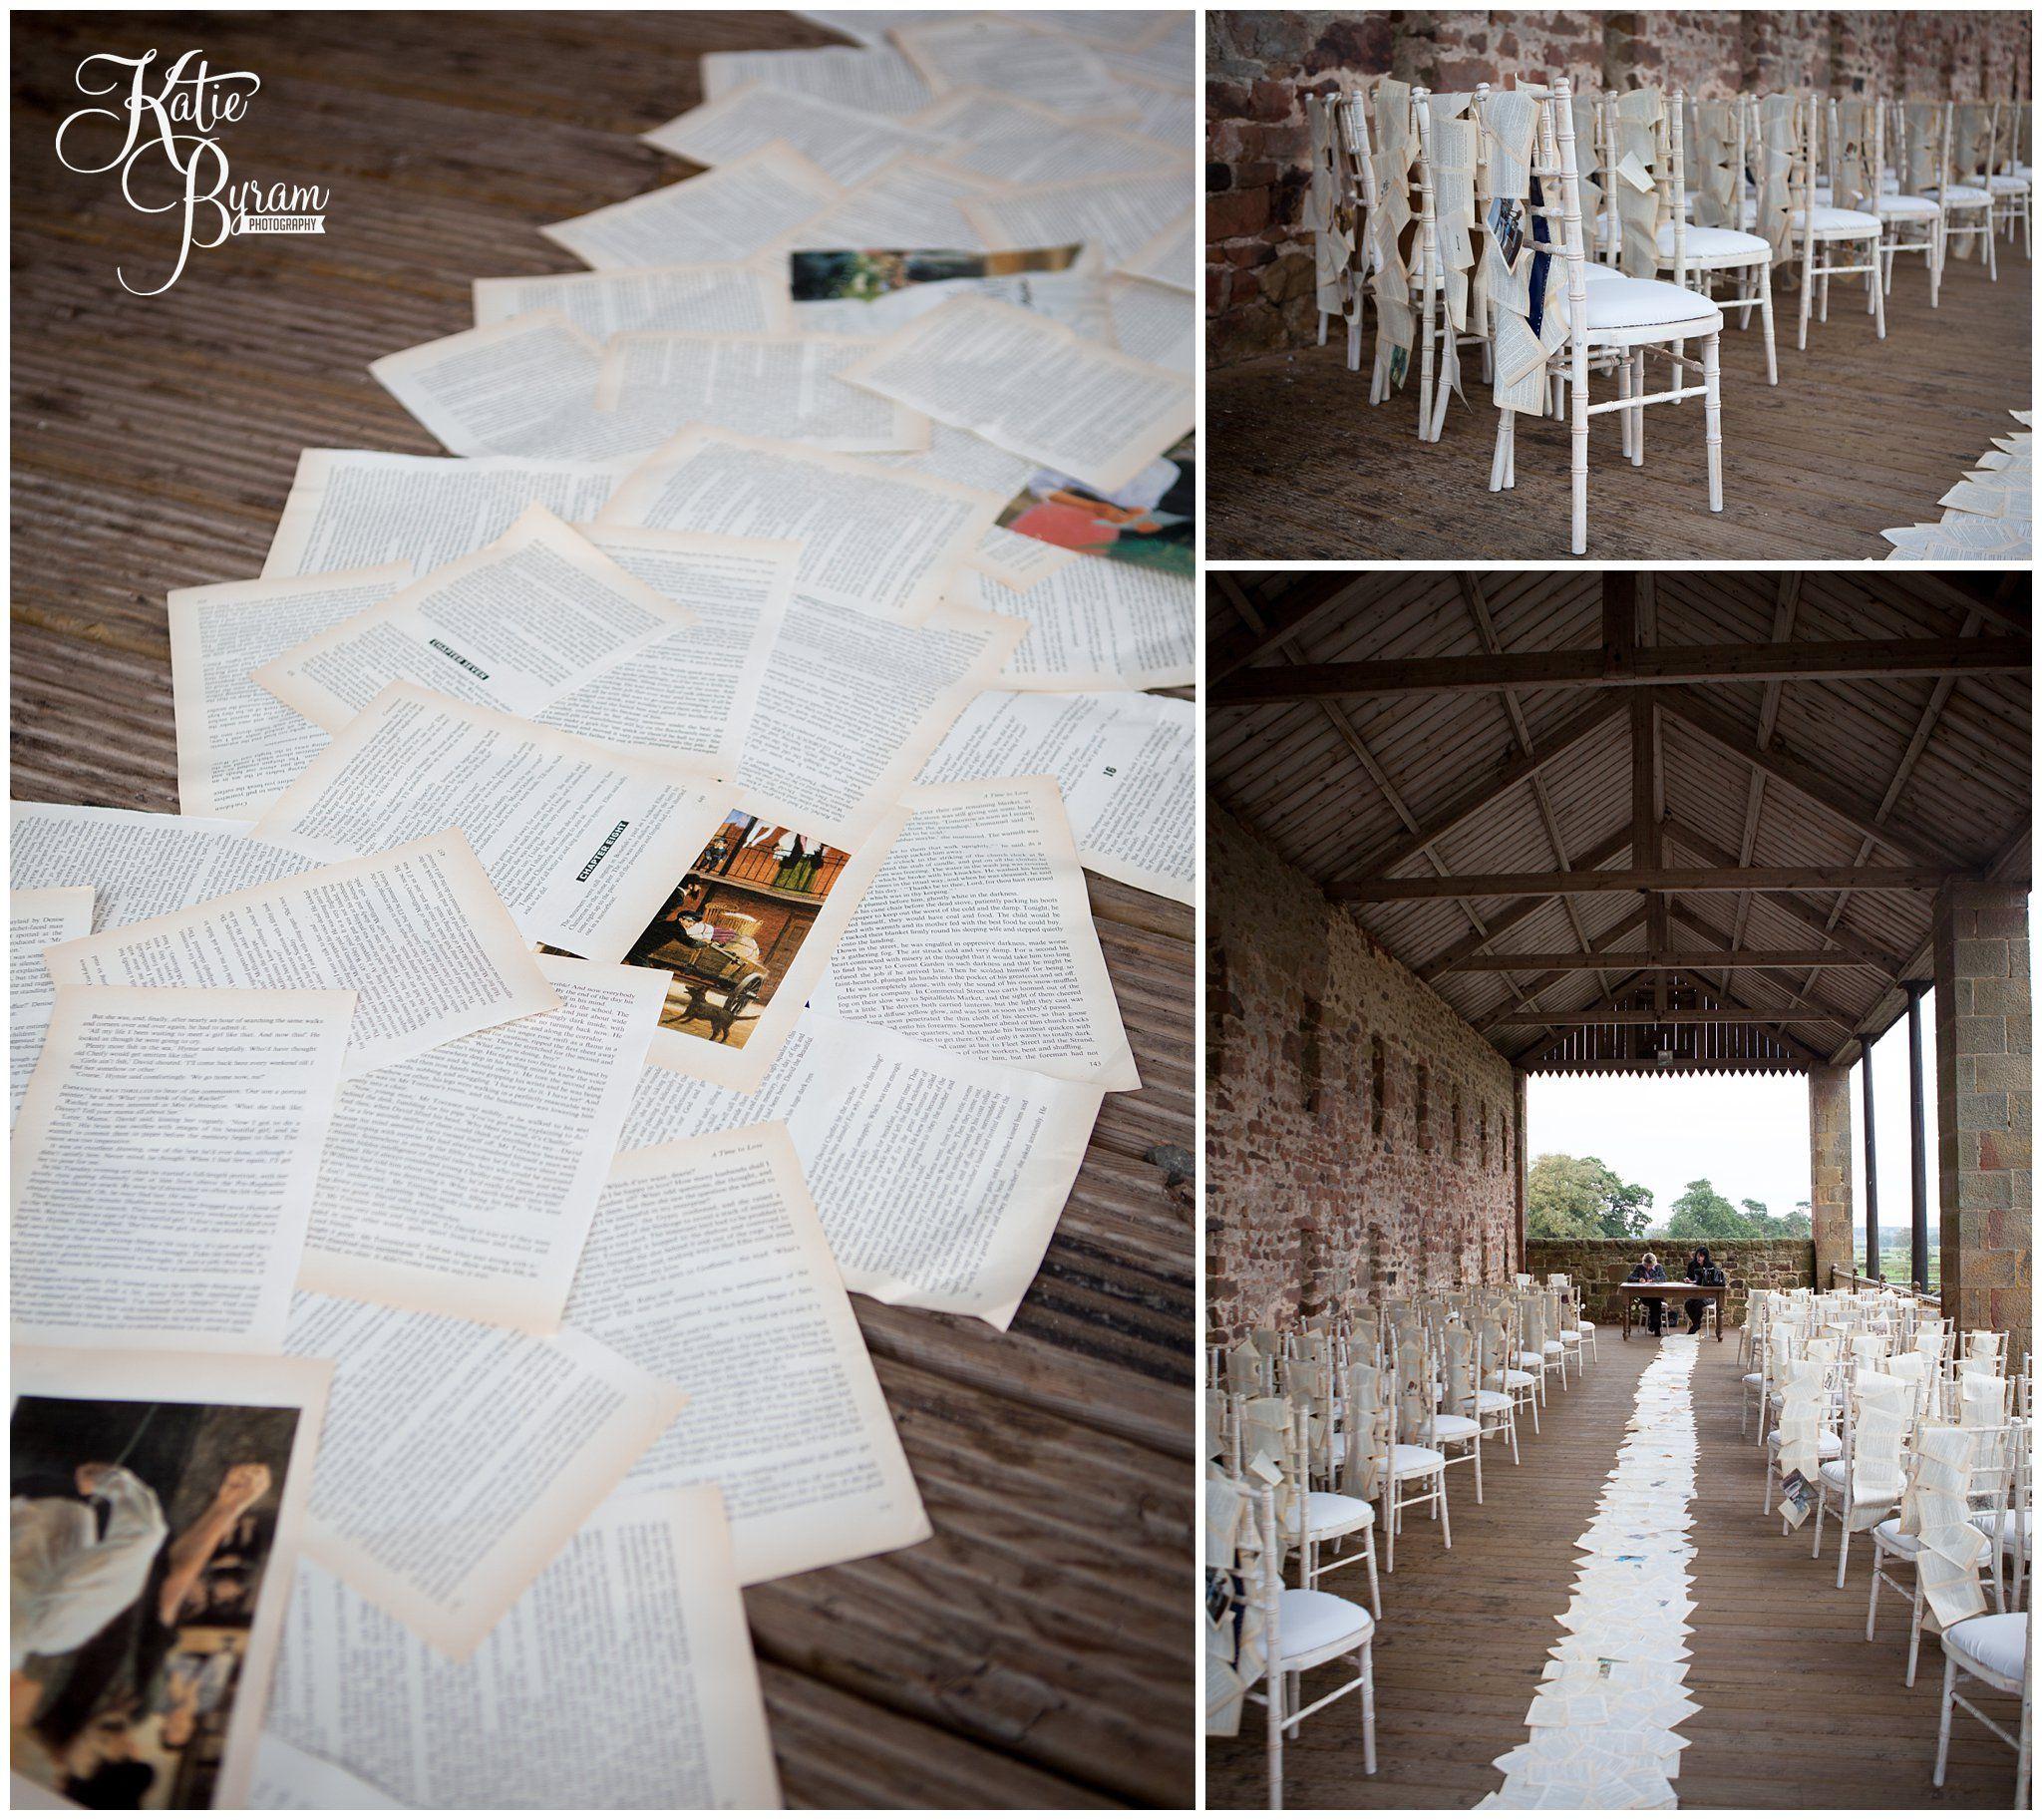 High House Farm Brewery wedding, book themed wedding, aisle runner ...